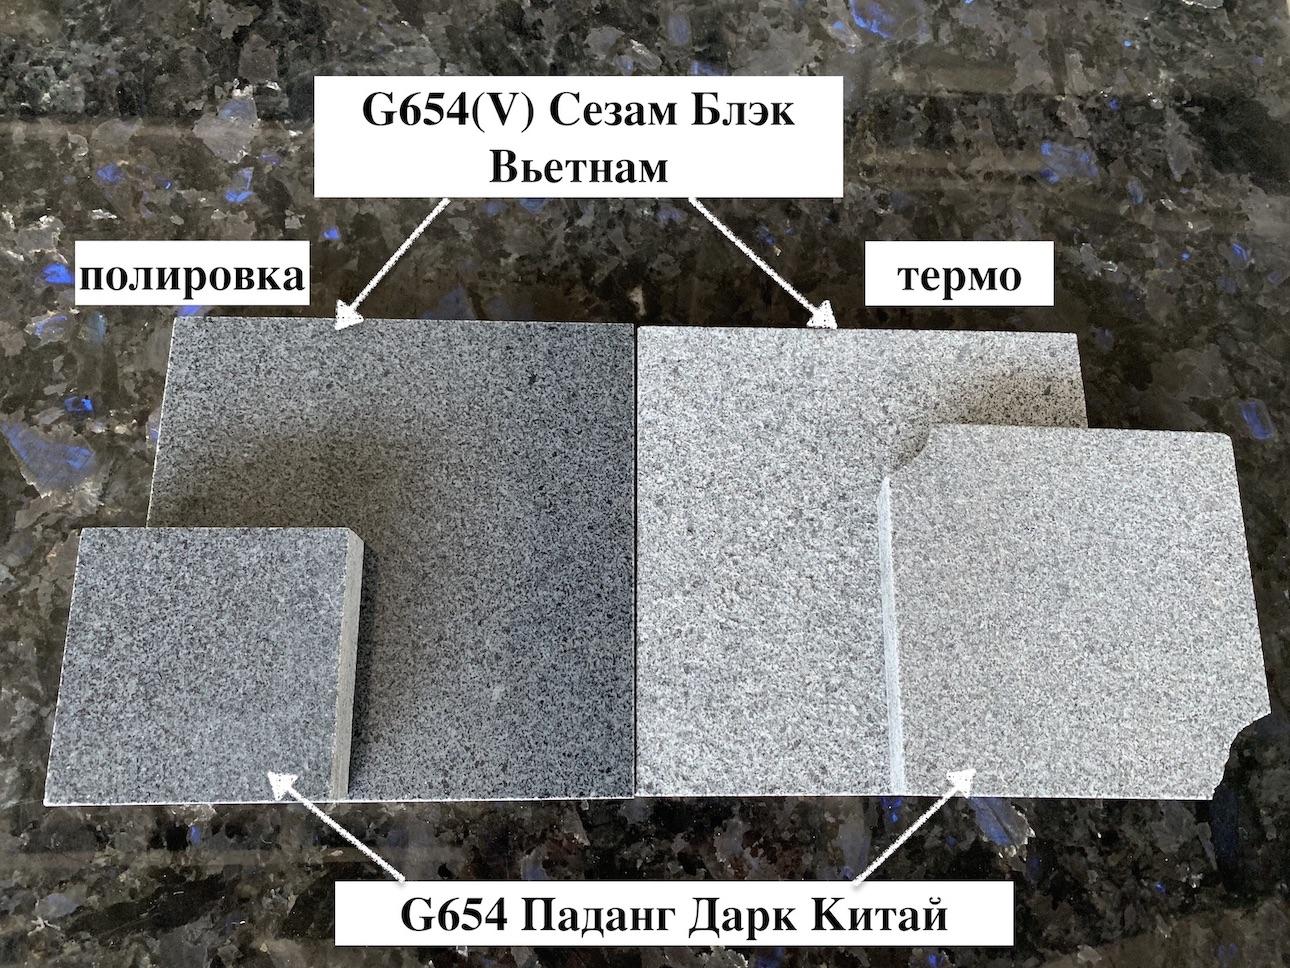 G654(V) Sesame Black фото 6051eafc39313